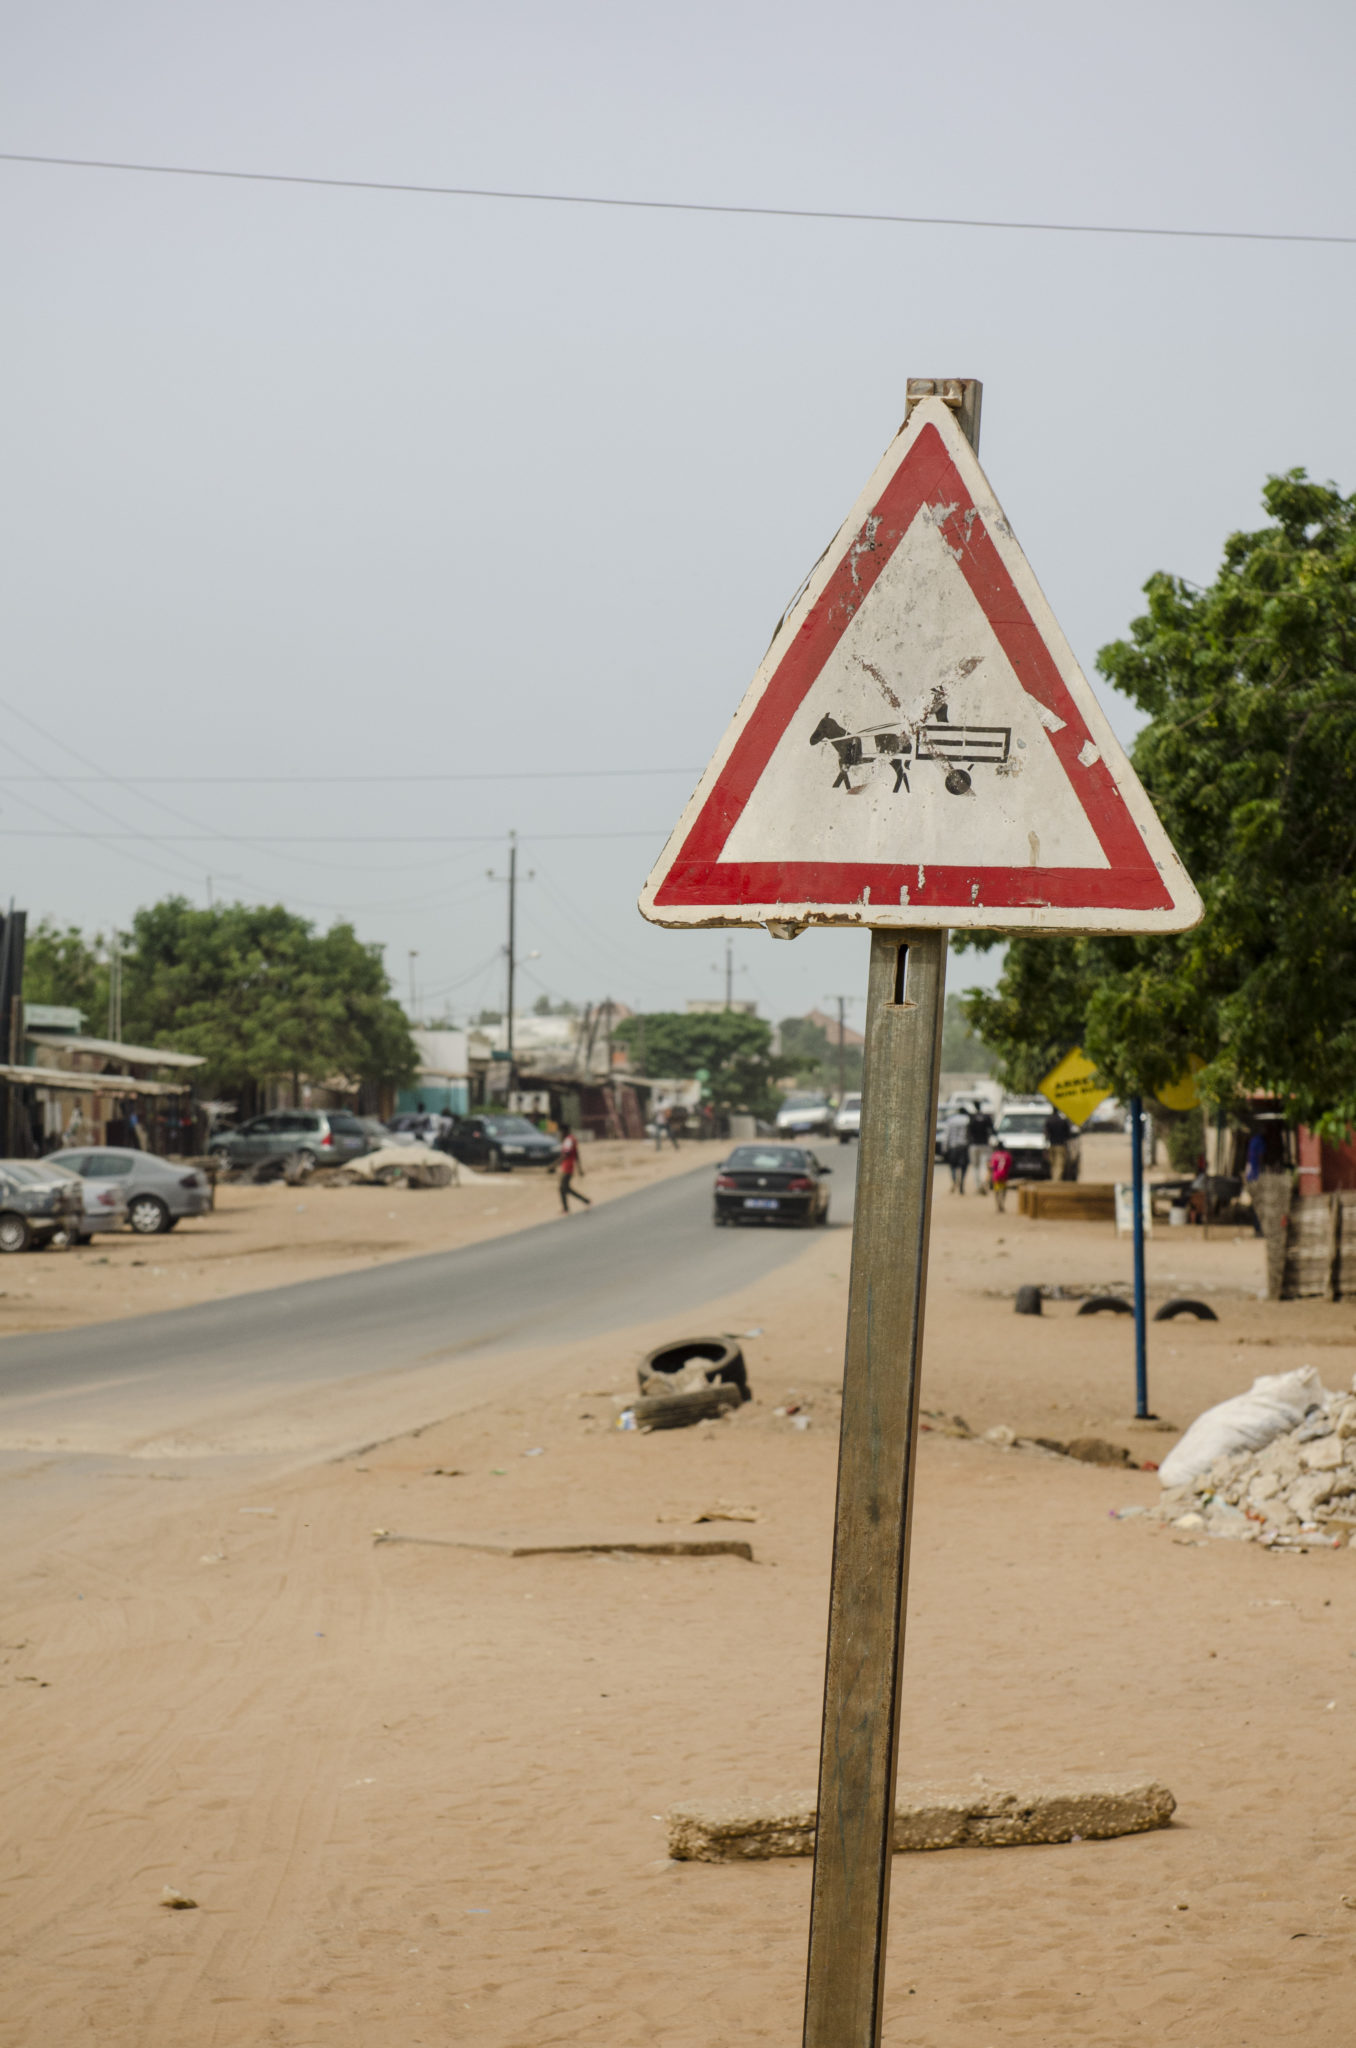 Mbour-Petite-Cote-Senegal-street-sign